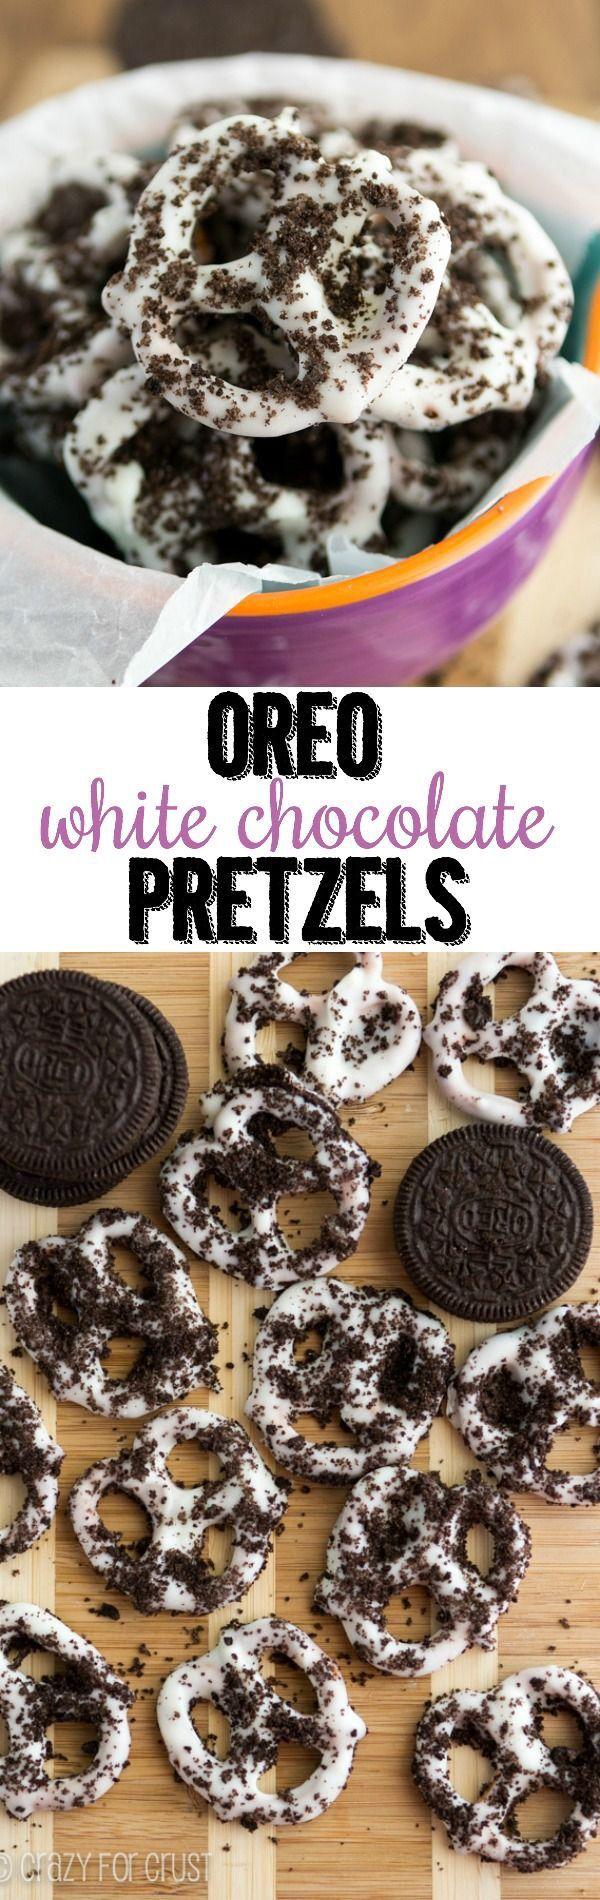 Oreo White Chocolate Pretzels